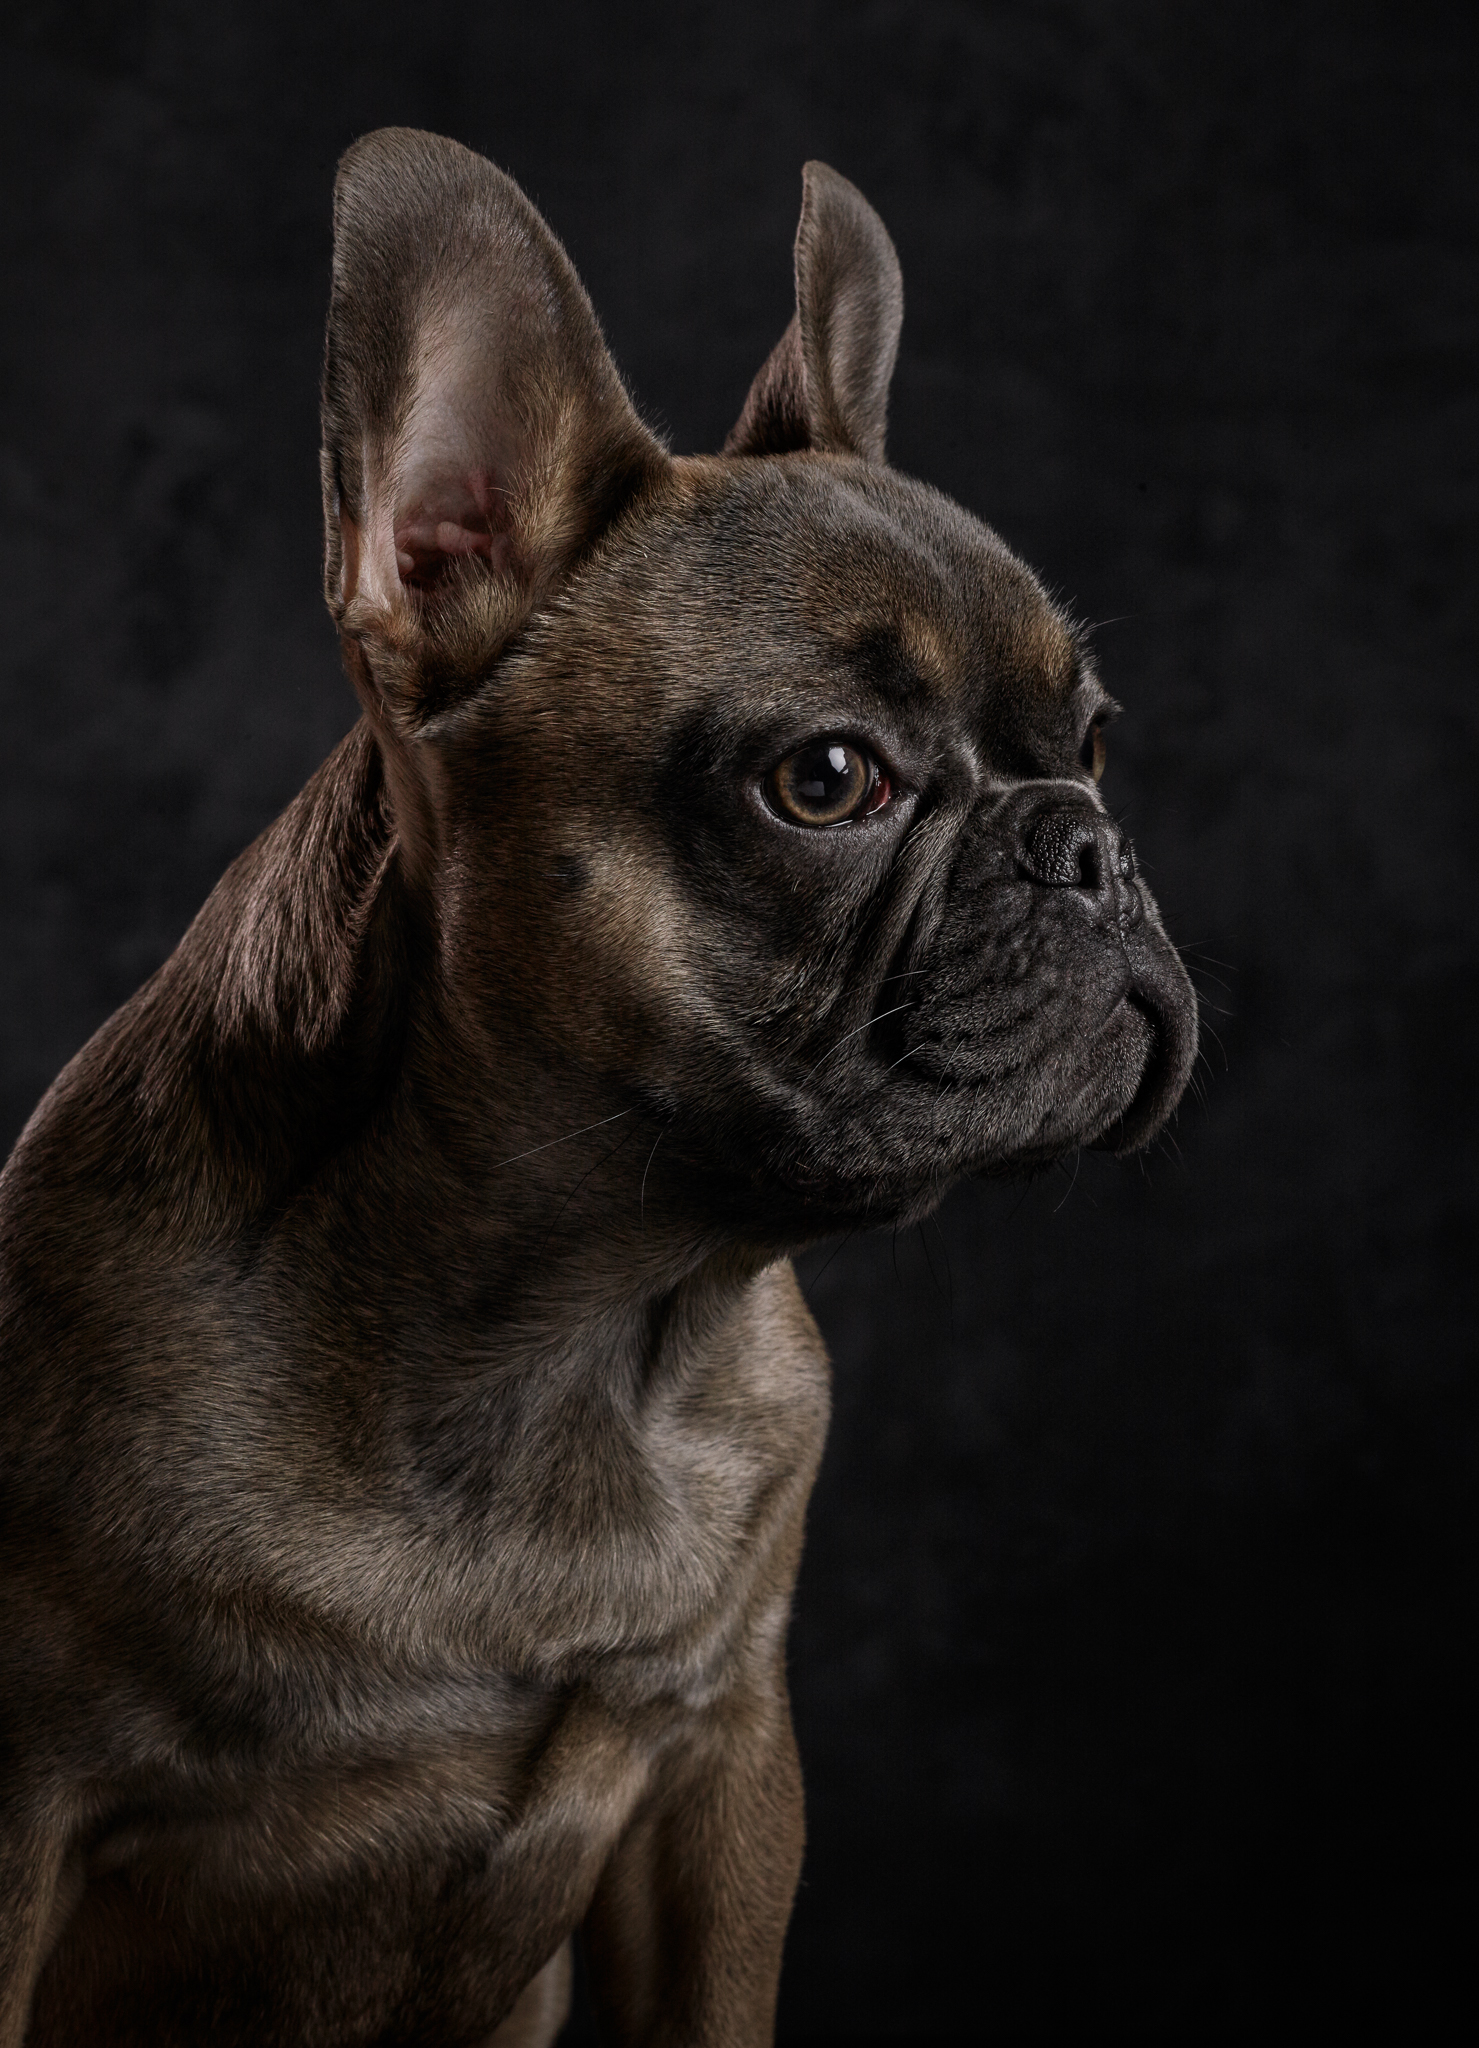 dog-photography-klaus-dyba-6.jpg